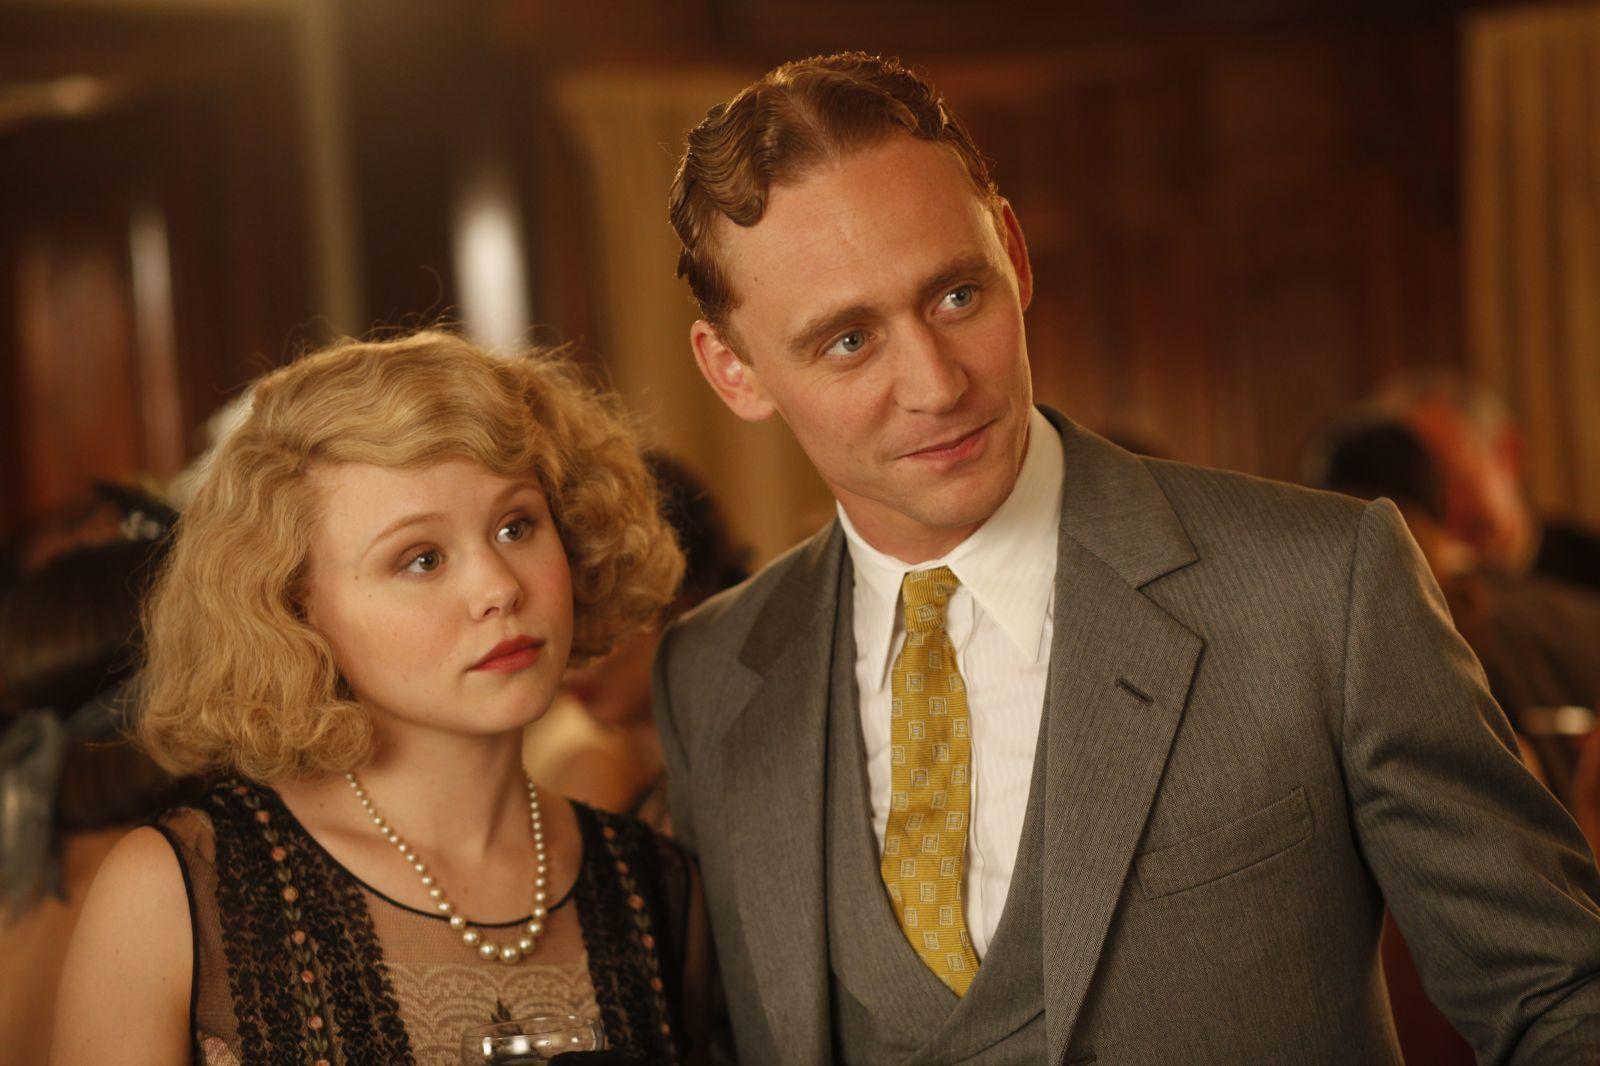 Alison Pill and Tom Hiddleston in Midnight in Paris (2011)